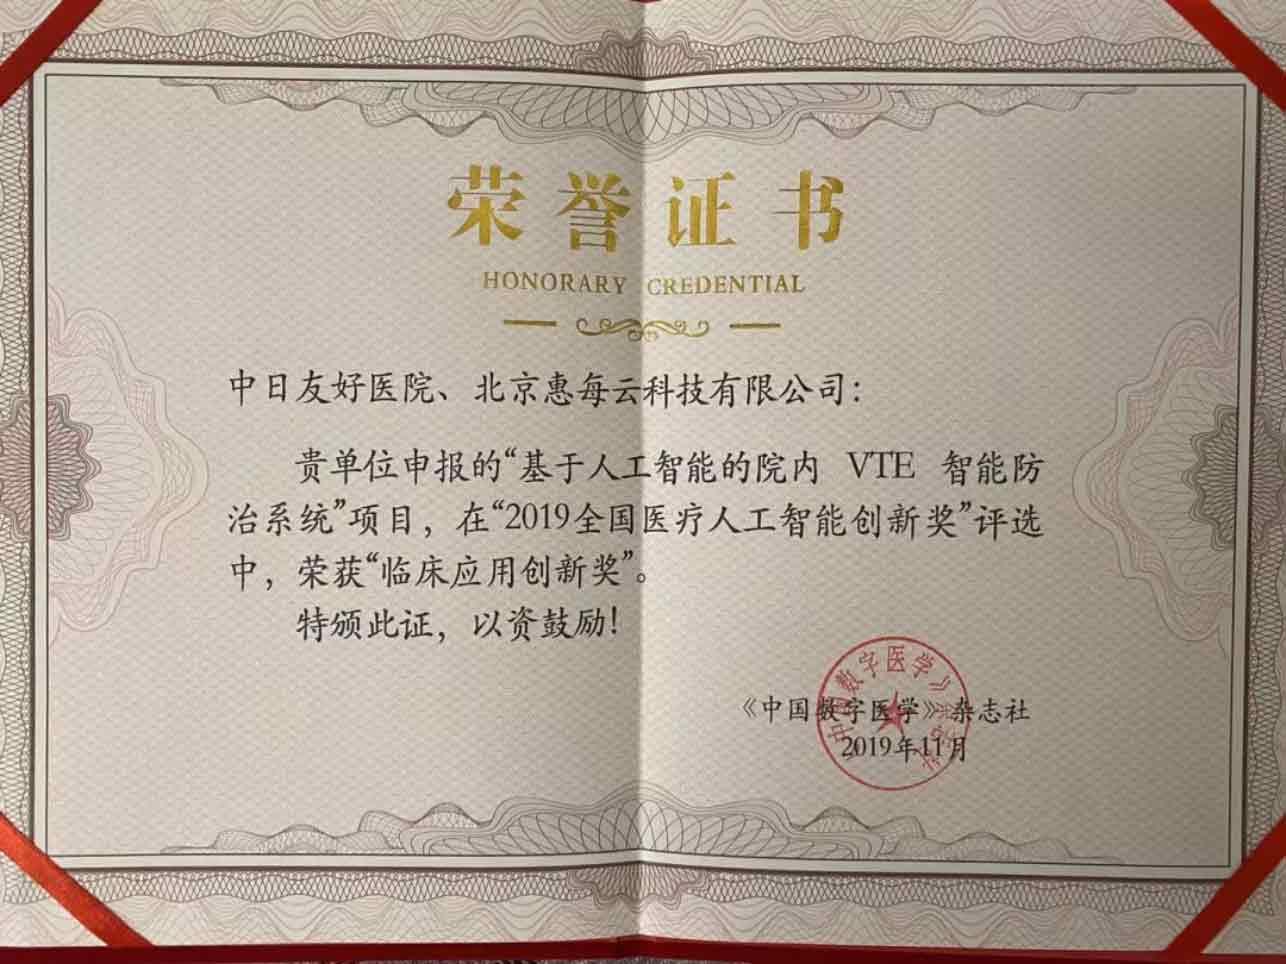 http://www.huimei.com/real/img/_@@_15764665455506200.jpg